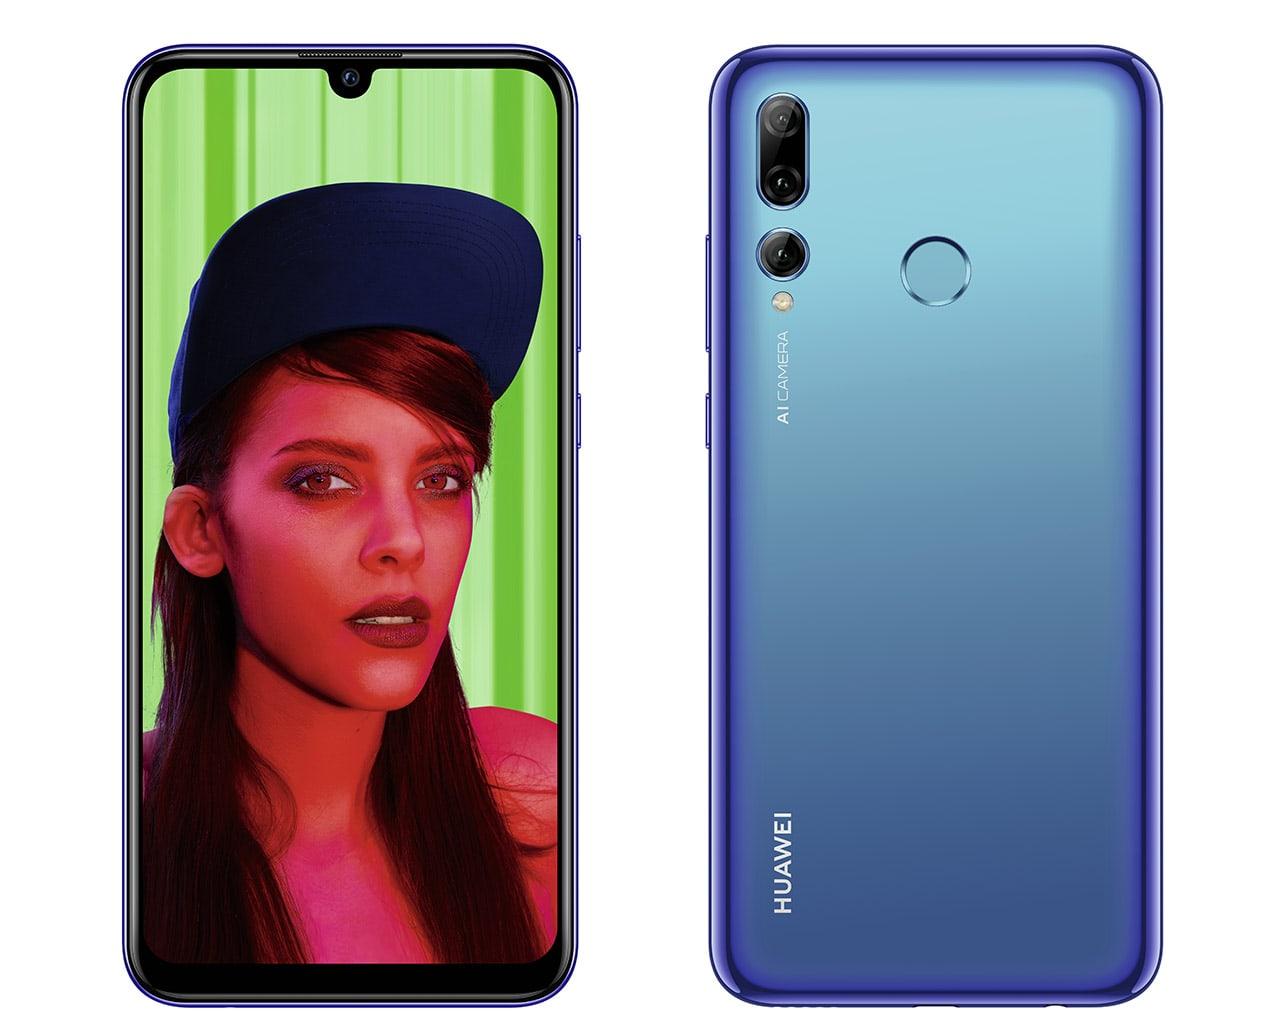 Huawei P Smart+ cámara frontal